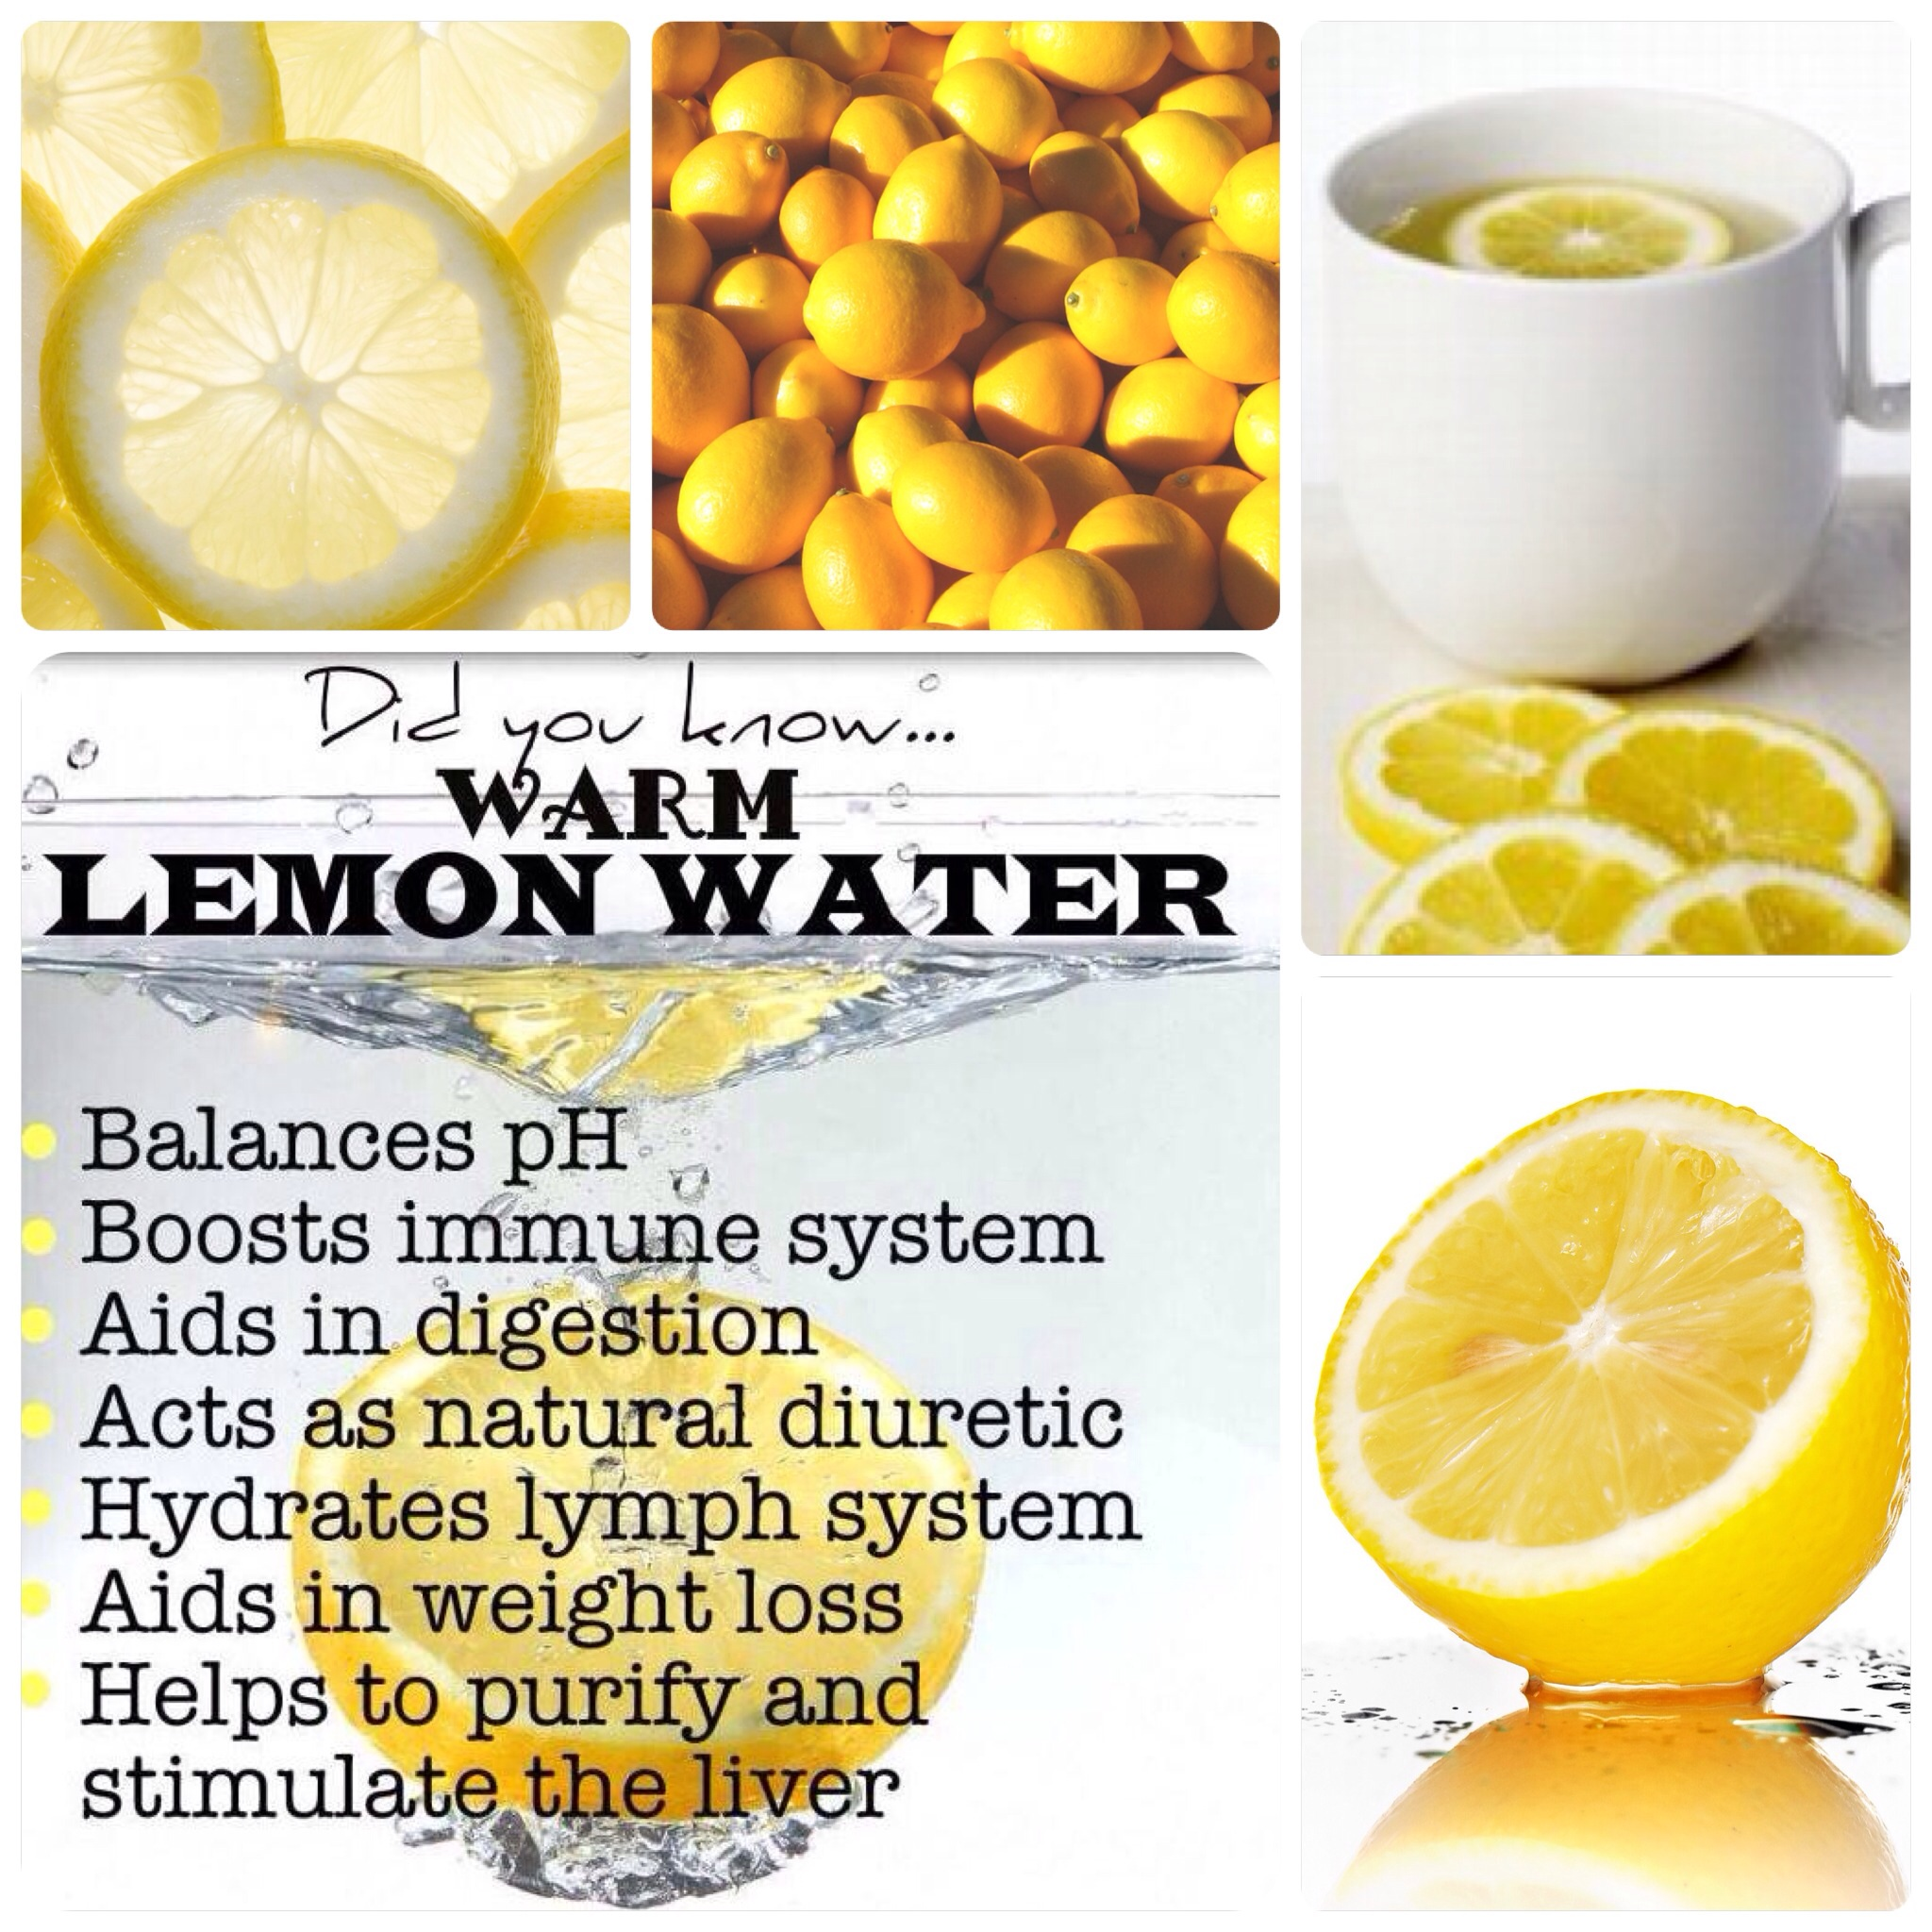 Health Benefits of Lemons, Lemon Water